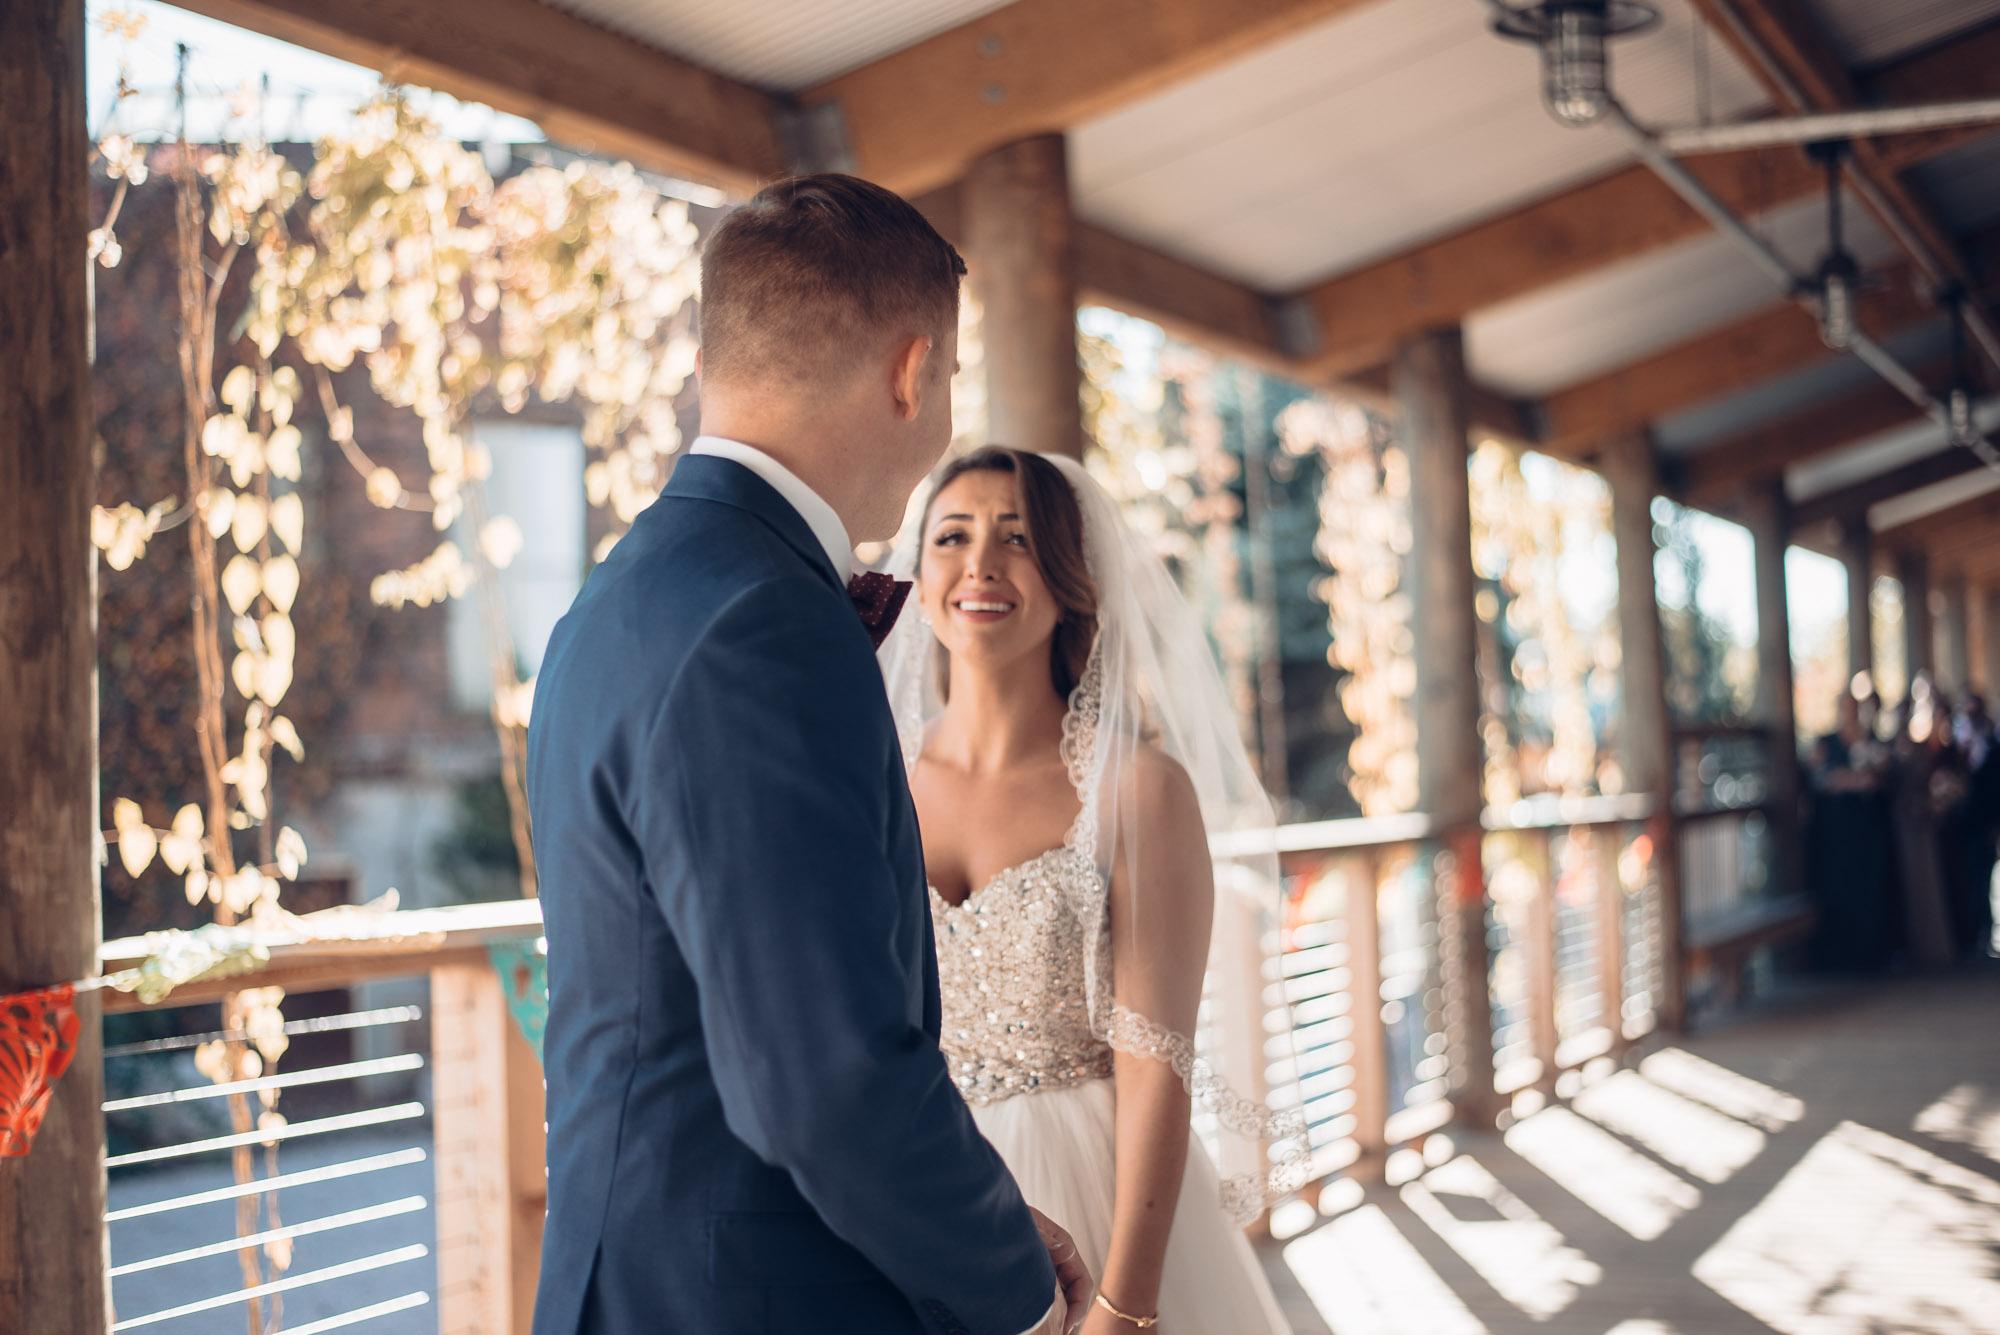 woodwinds_wedding_171020_web-23.jpg